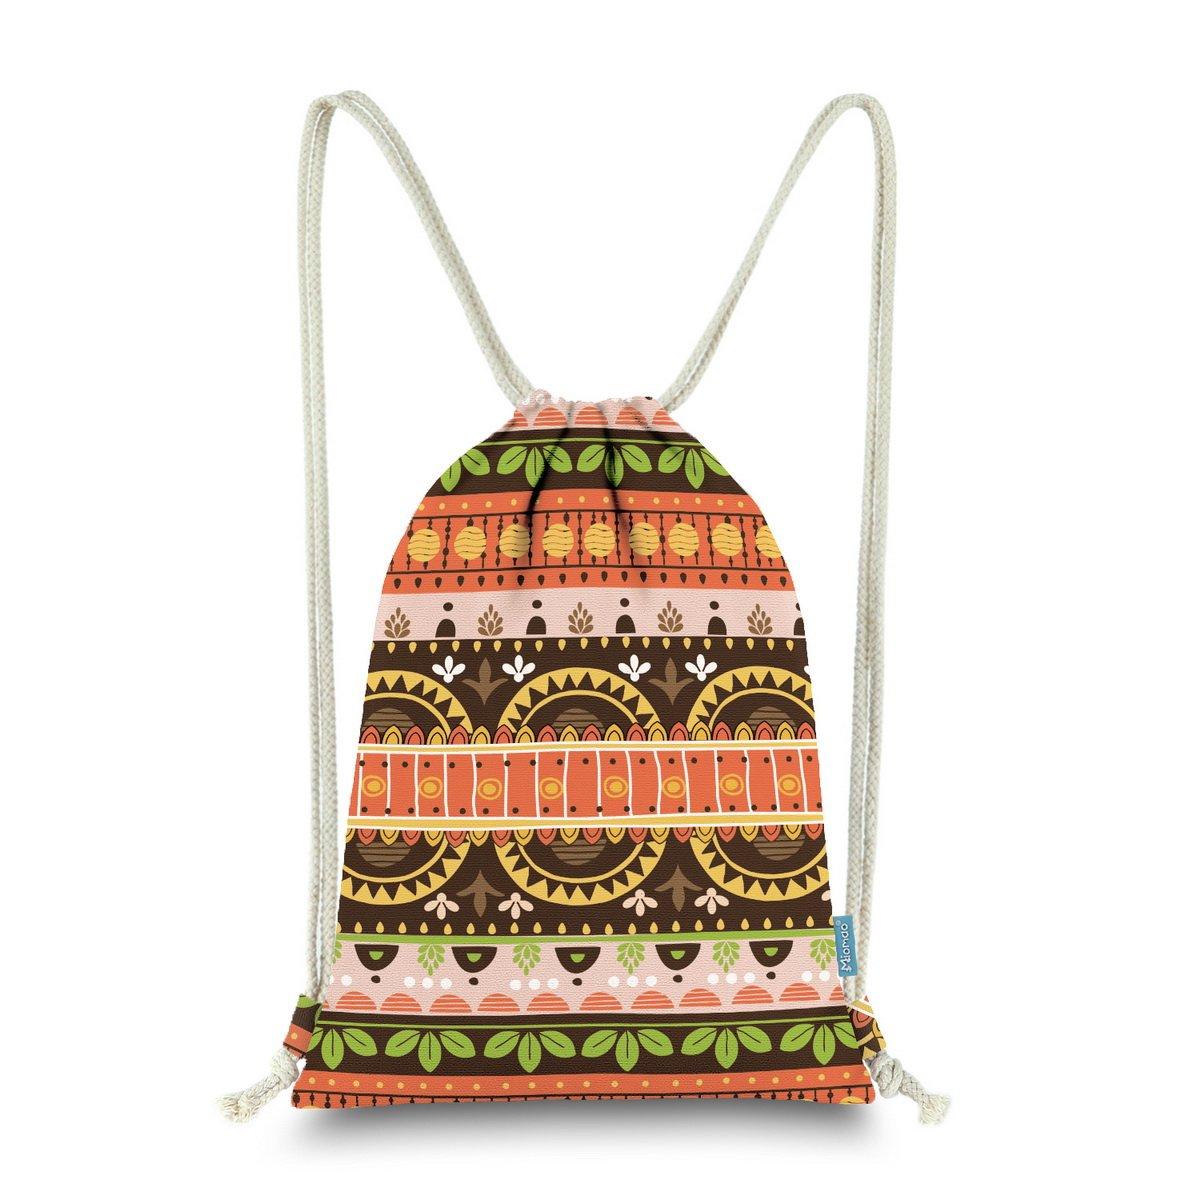 Miomao Gym Sackpack Drawstring Backpack Ethnic Bohemia Style String Bag Fleece Boho Sinch Sack Sport Cinch Sack Christams Gift Beach Bag 13 X 18 Inches Orange